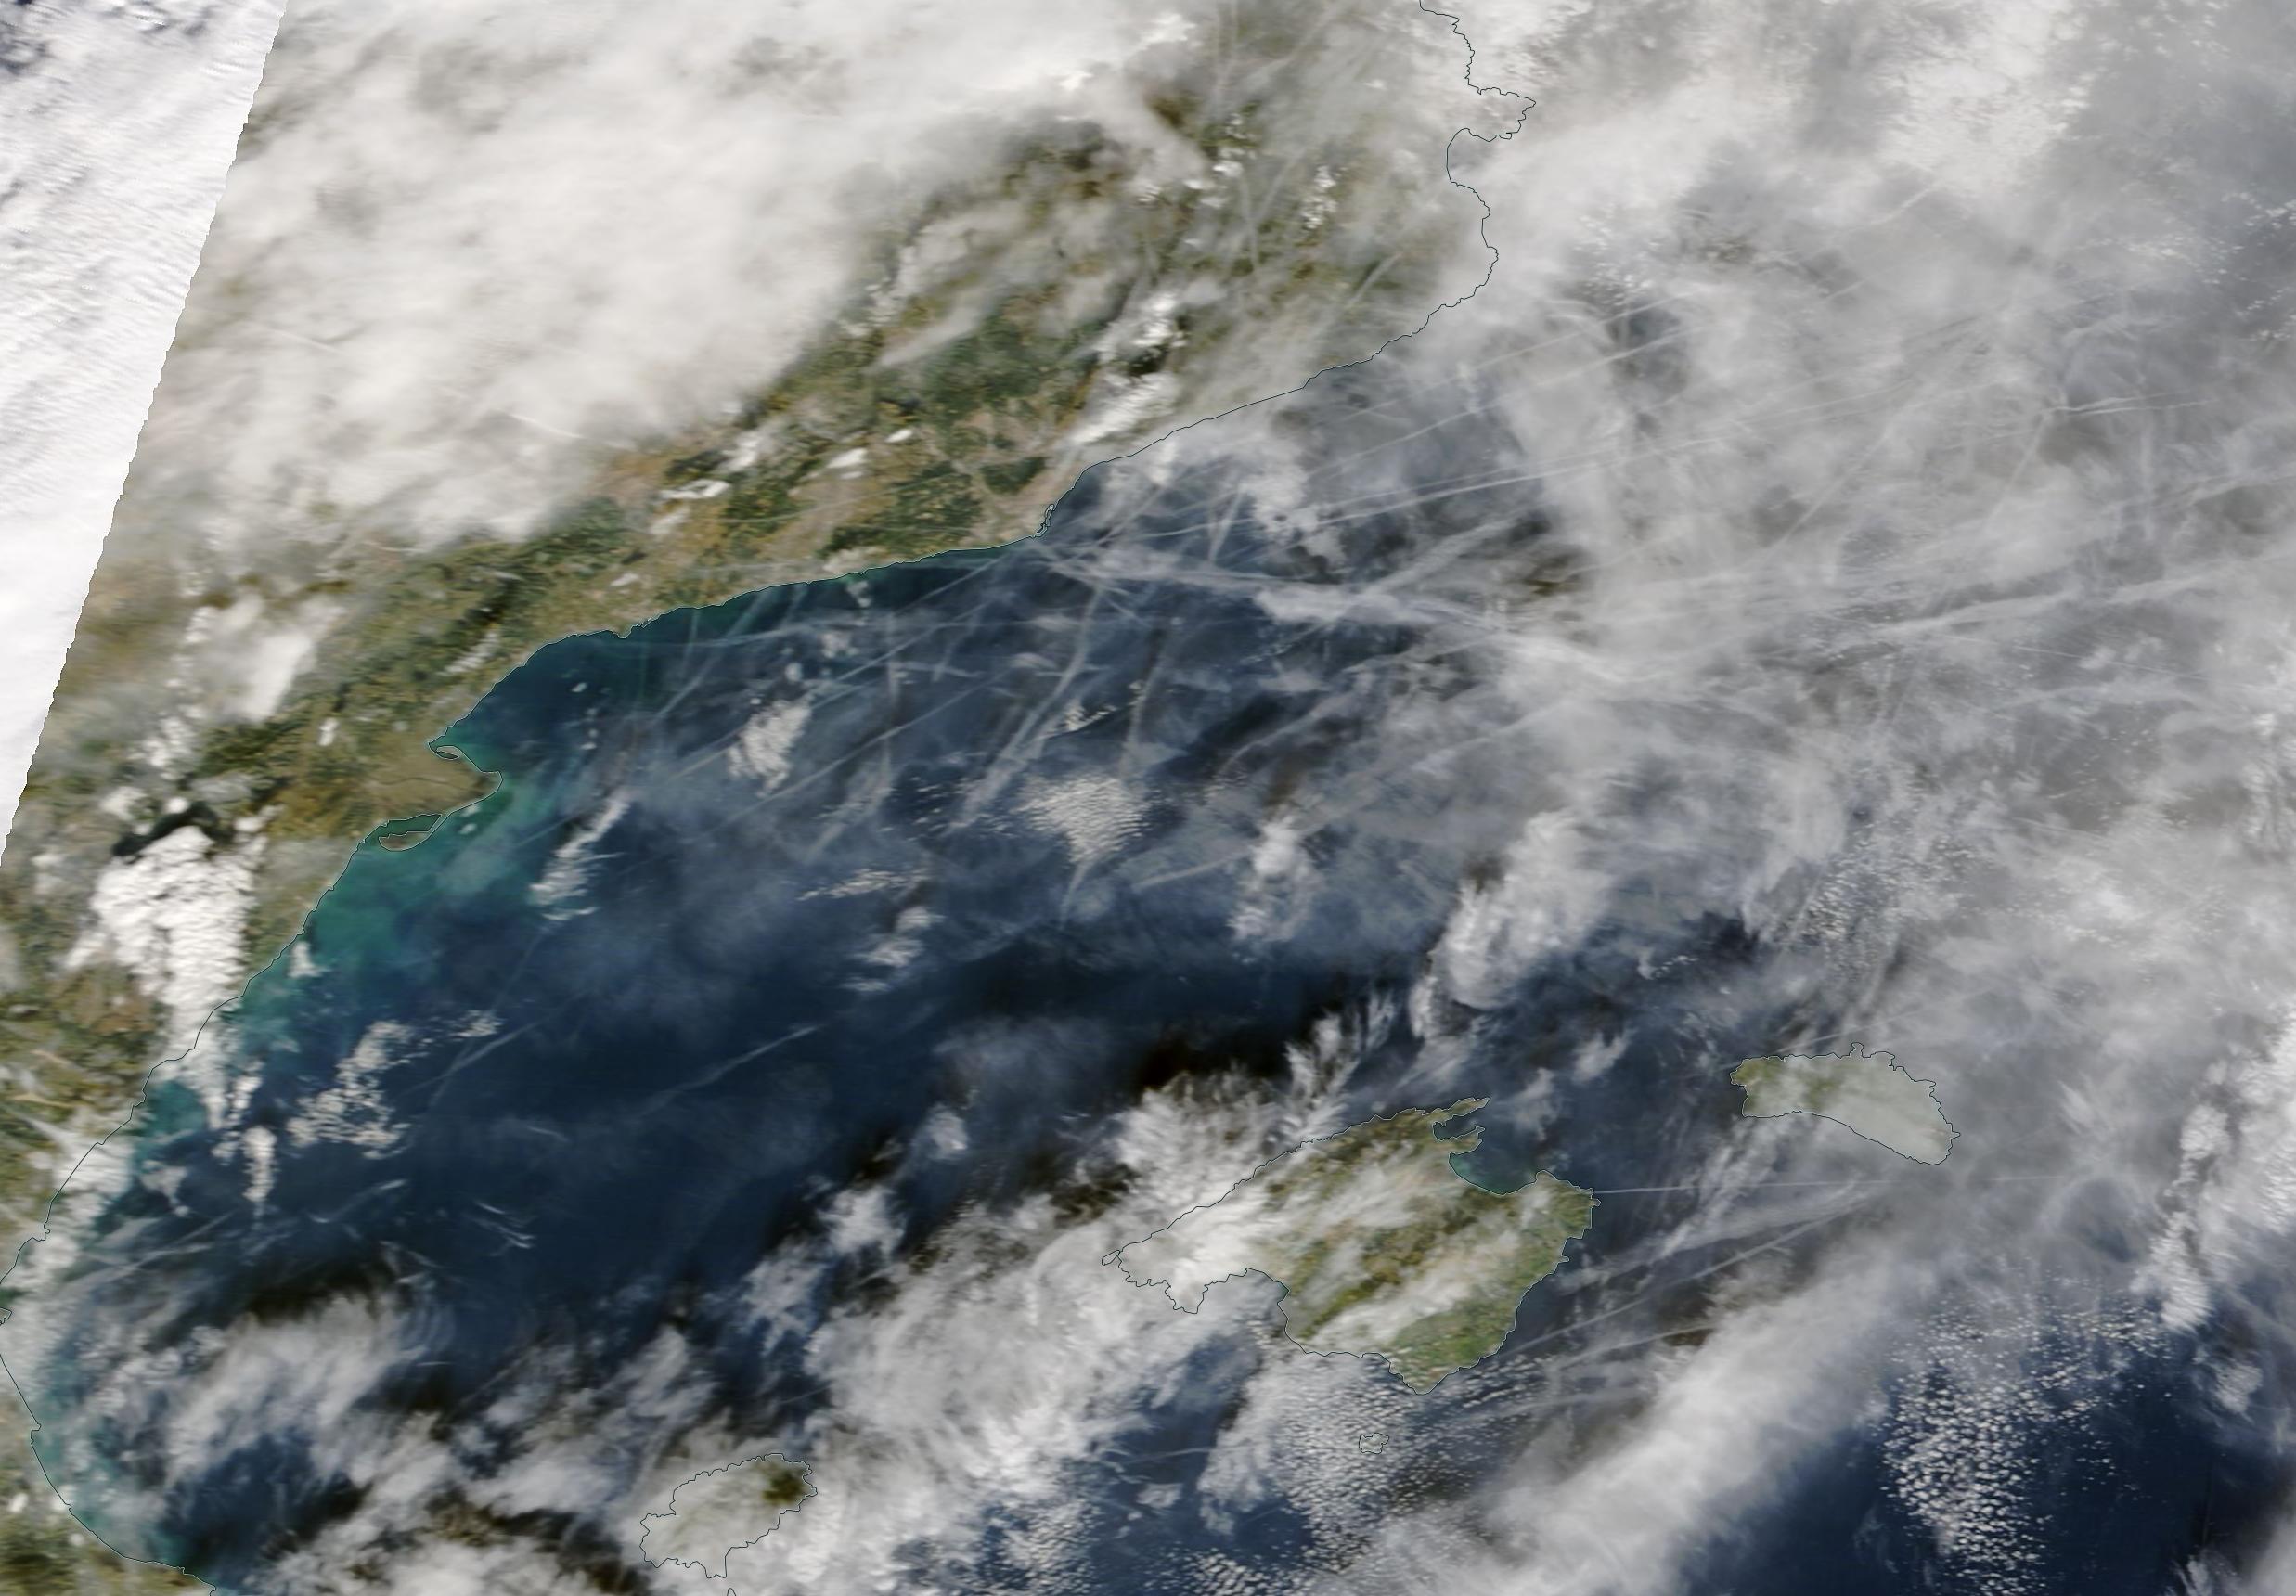 Barcelona, Ibiza, Mallorca, geoengineering chemtrails Wed 11th Dec 2019; Terra / MODIS https://go.nasa.gov/2LF3pmD